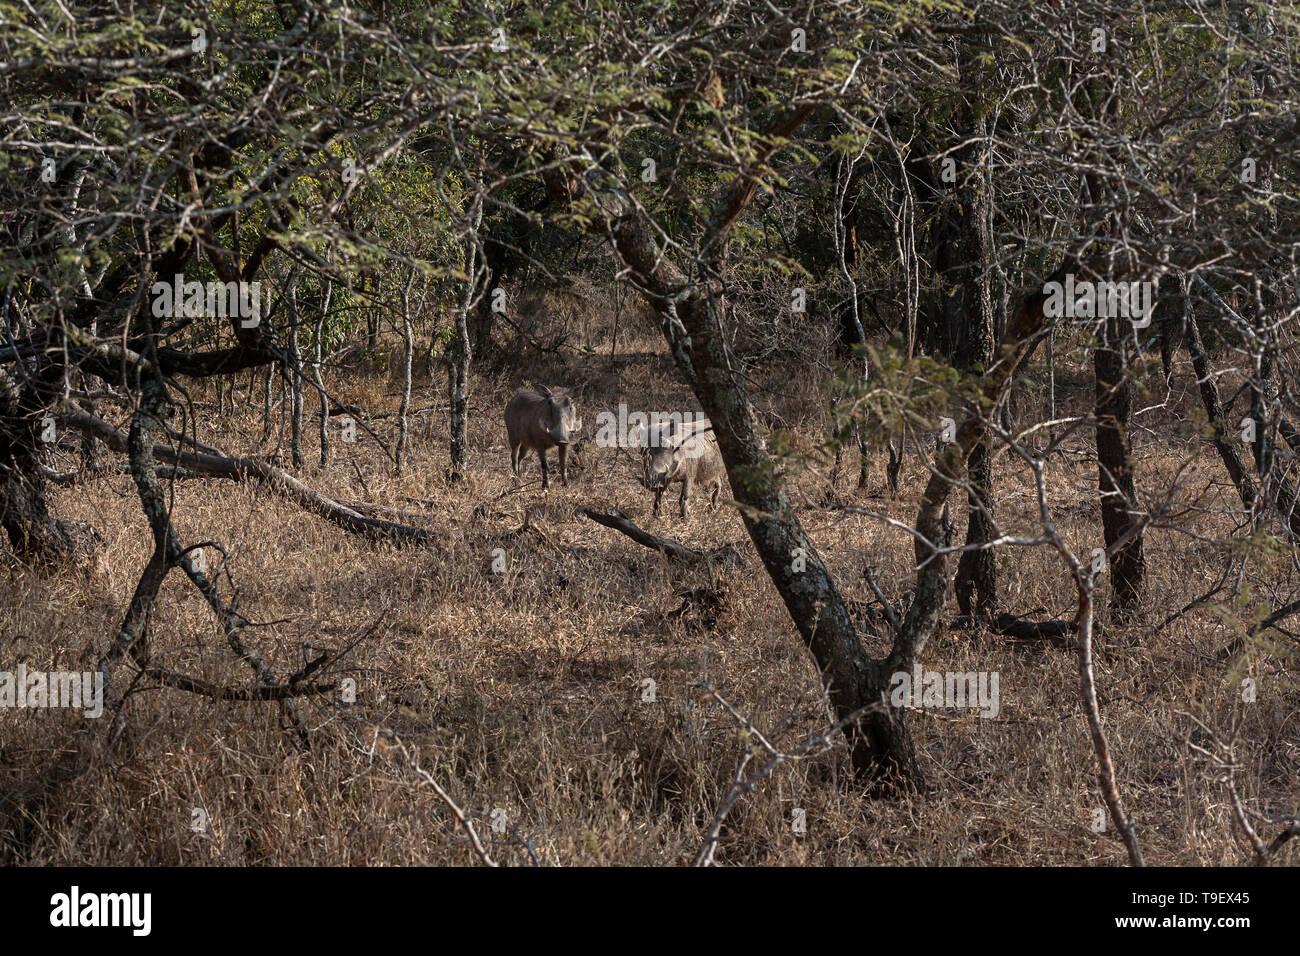 Warthog sightings in bushveld on safari in Africa - Stock Image